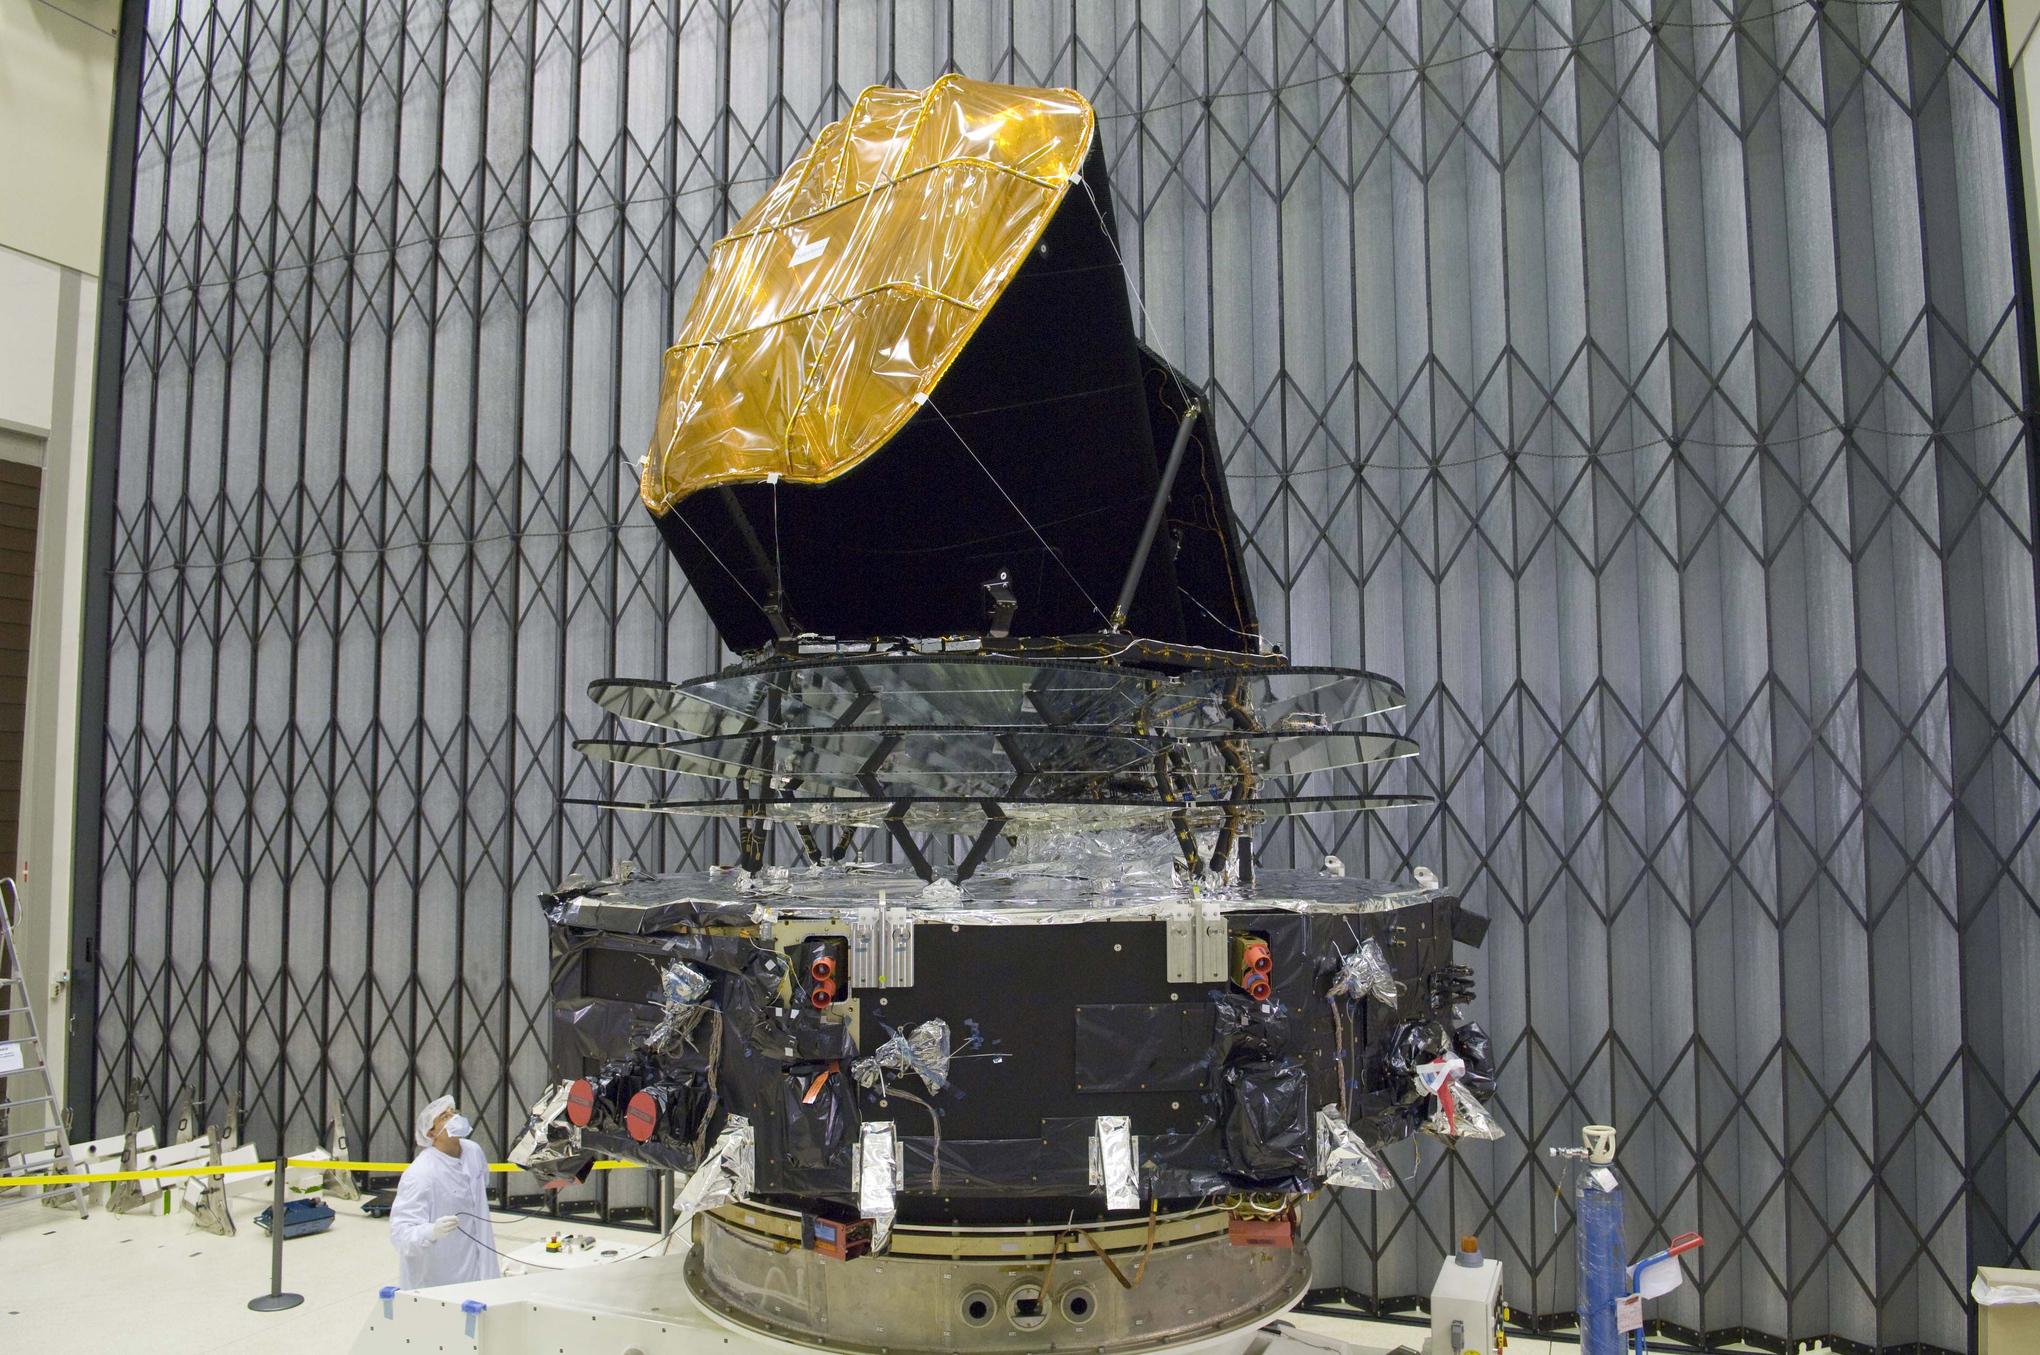 Planck-spacecraft__id_pavo2008-1349_h